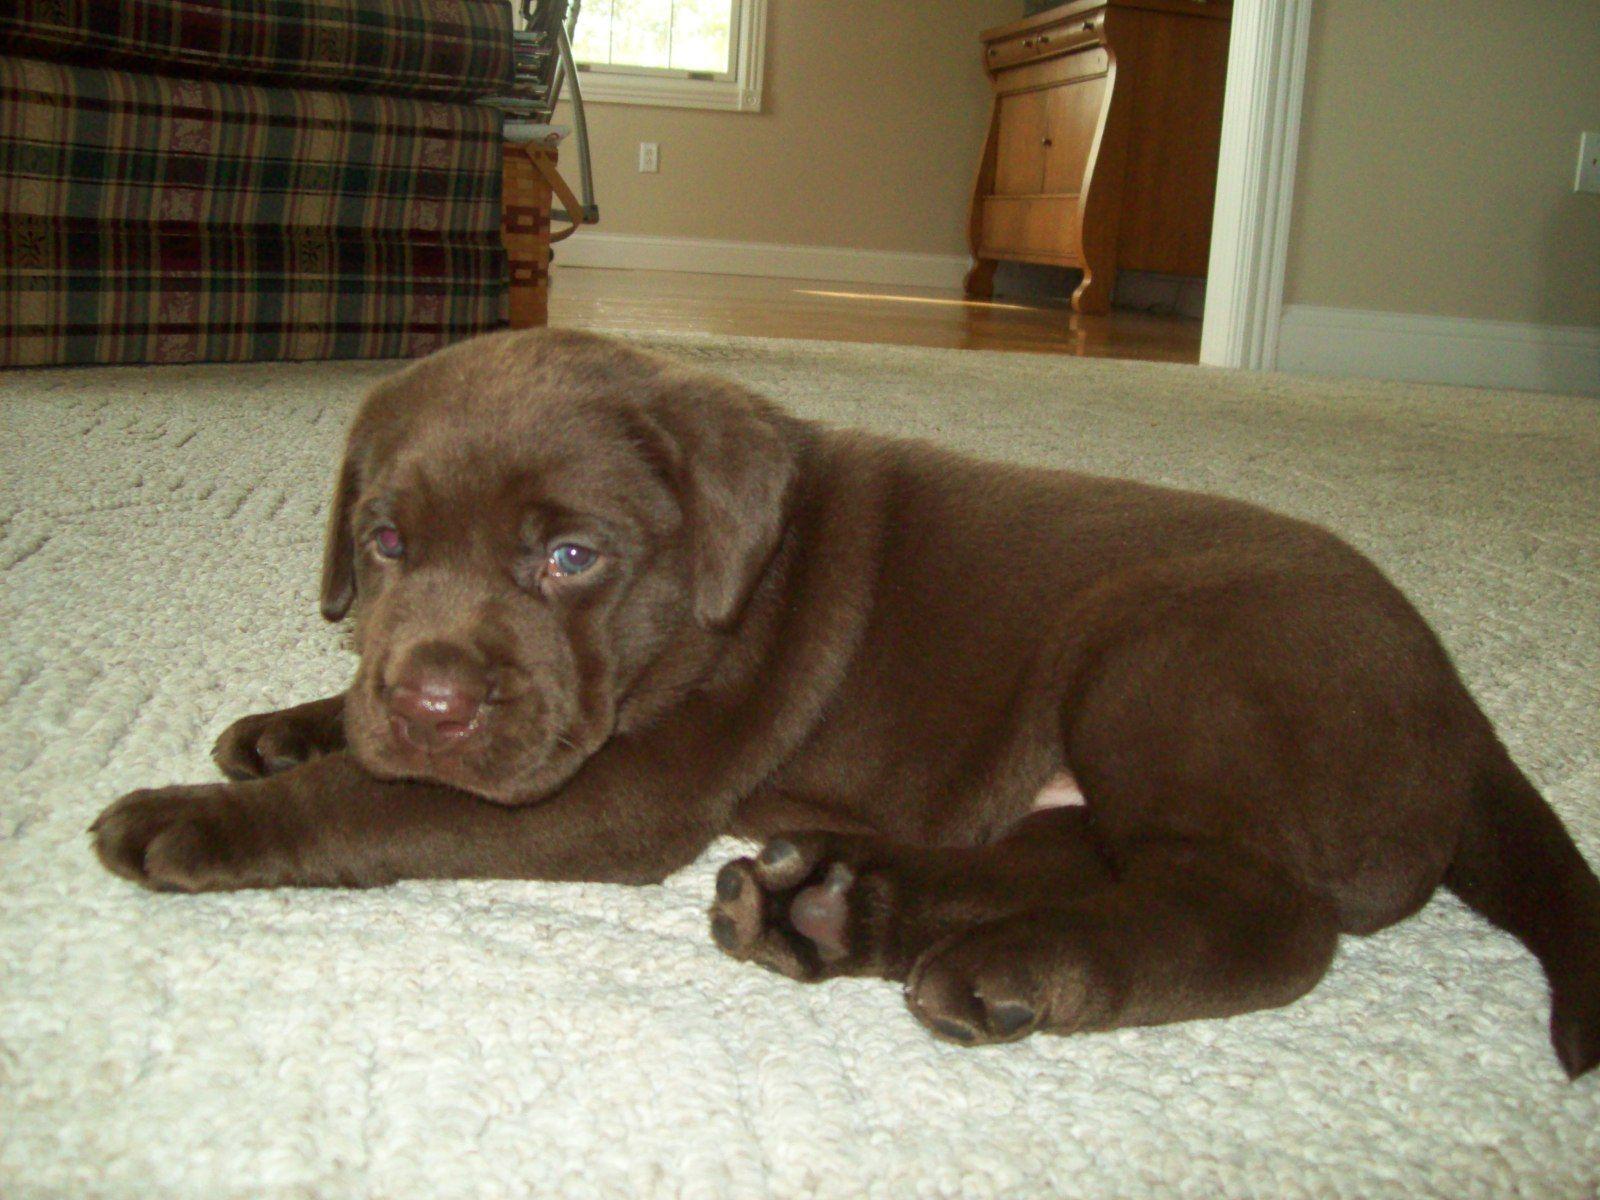 Akc Registered English Labrador Puppies English labrador